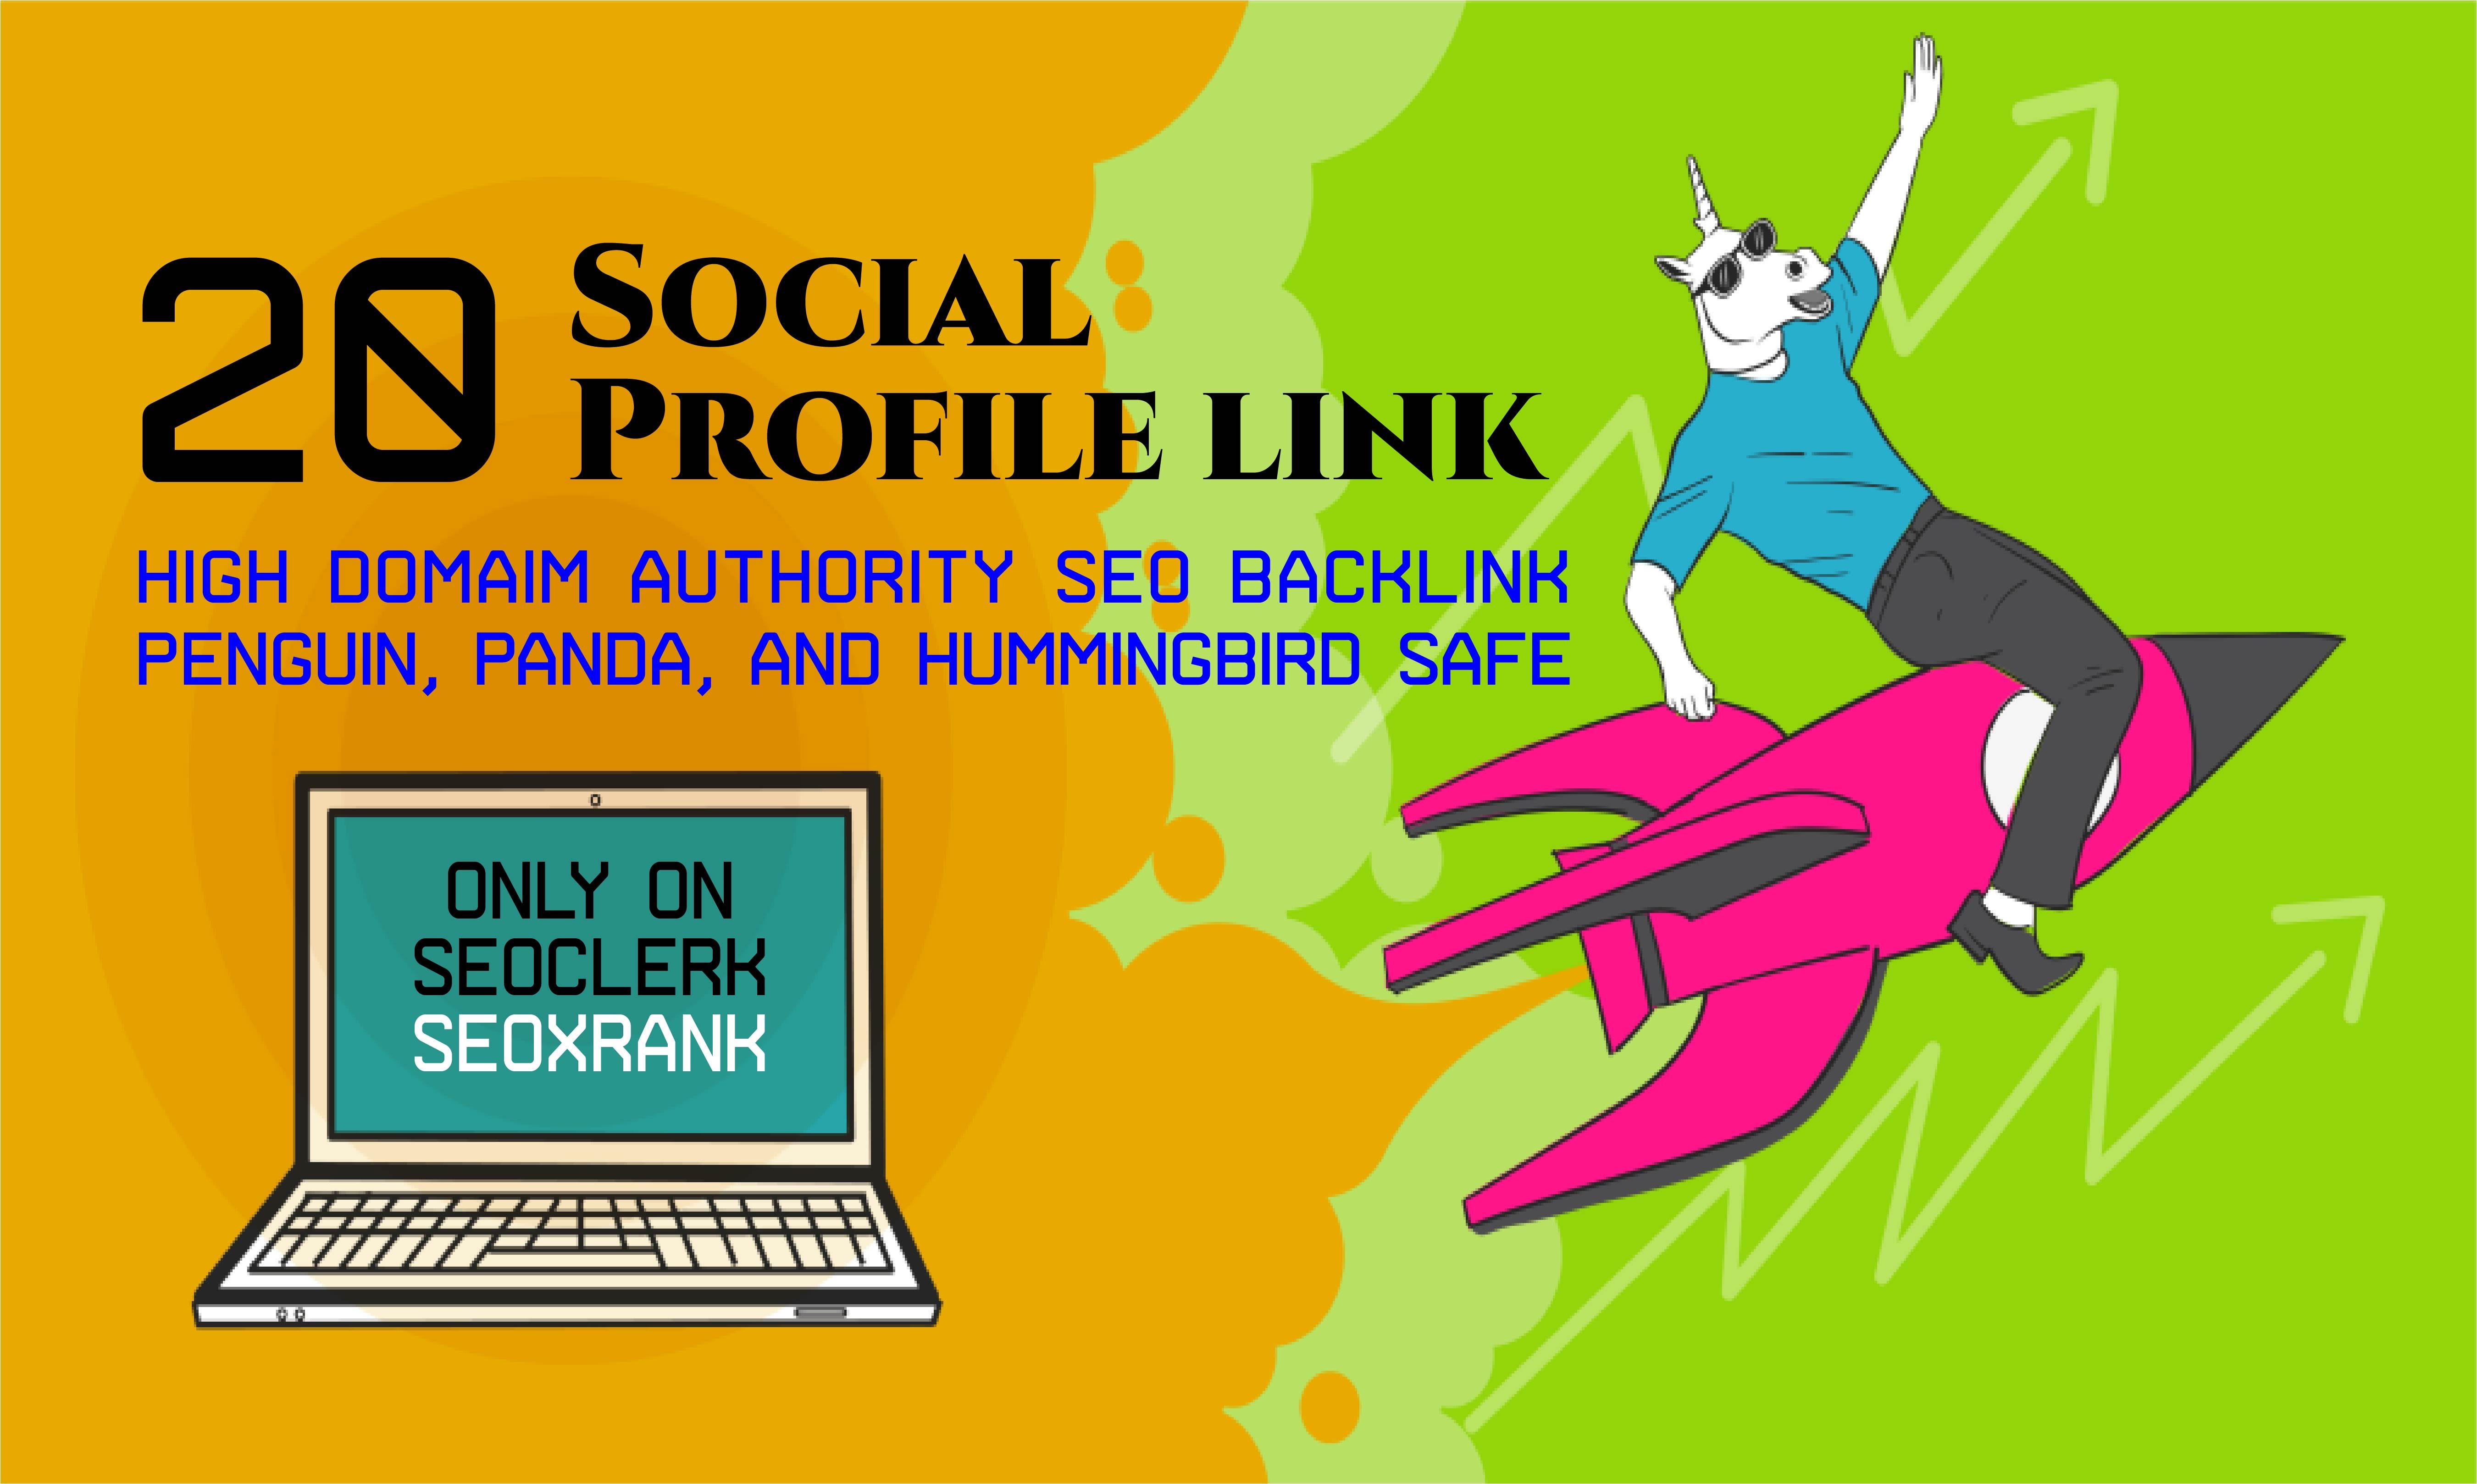 Create 20 Social Profile Links DA80-DA100 to Boost Your Google Ranking